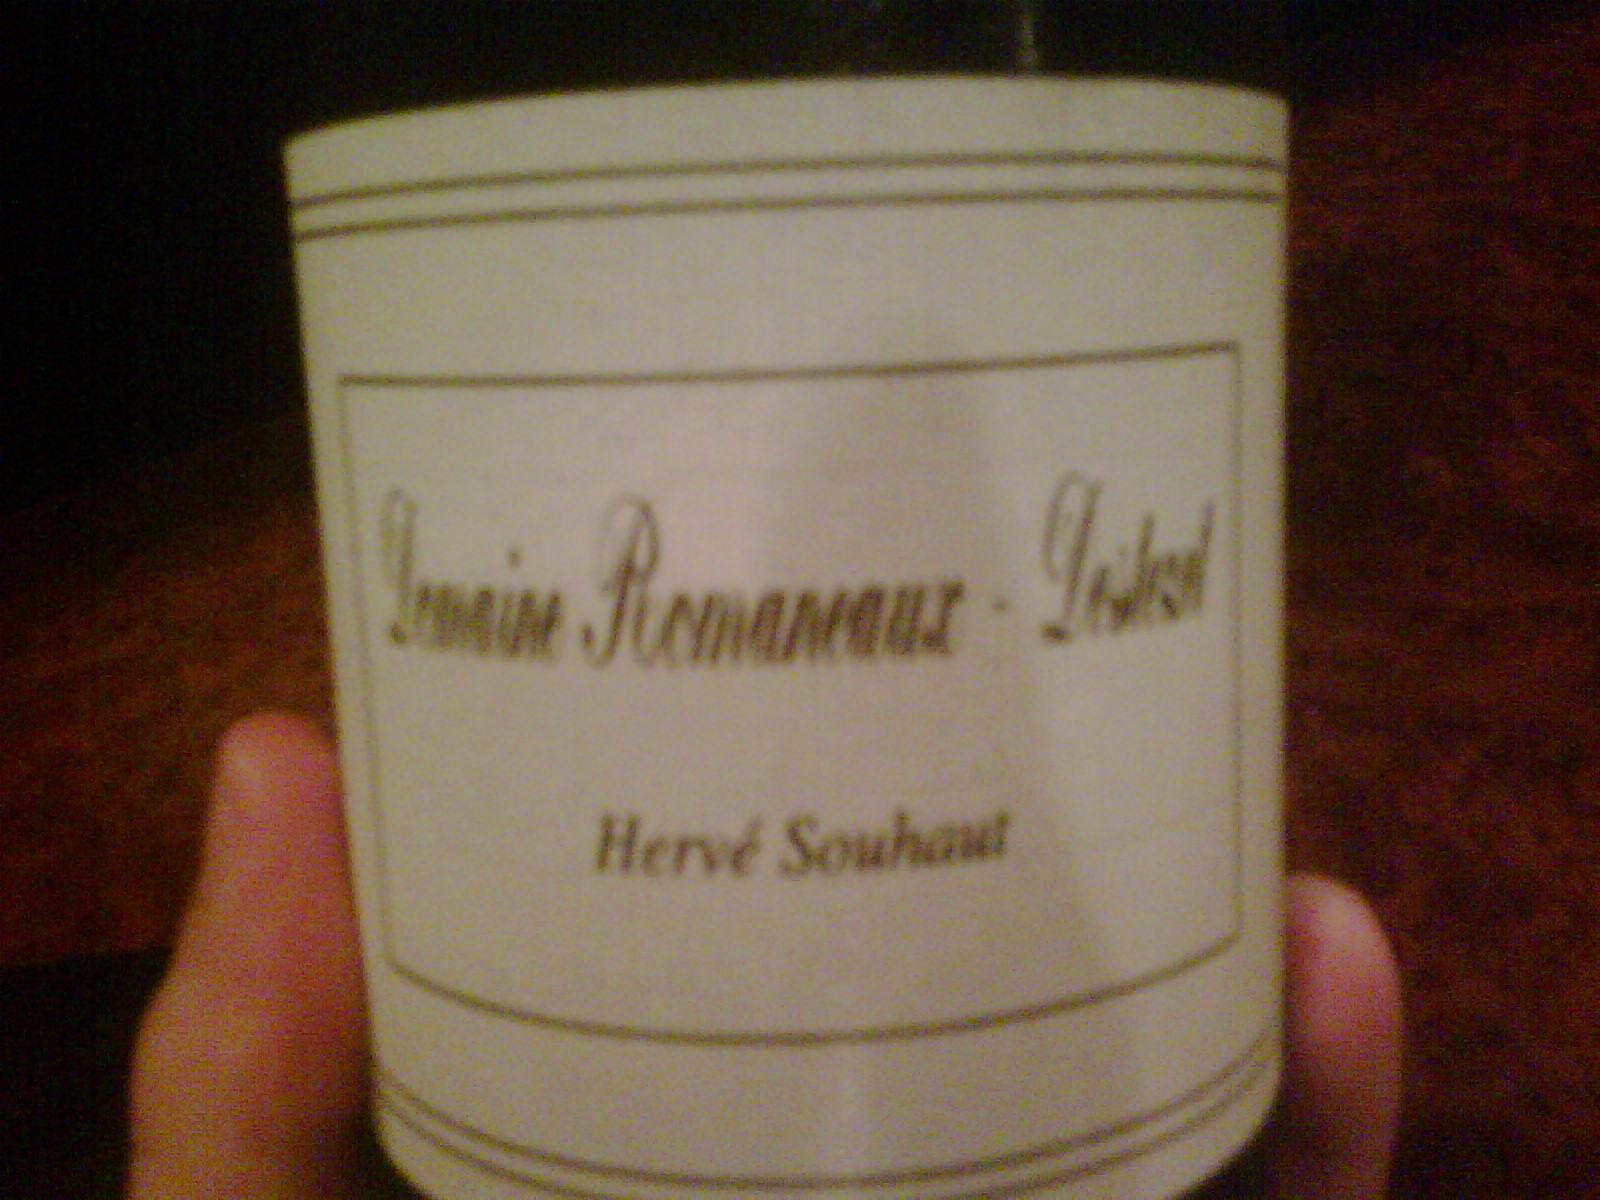 Antic Wine